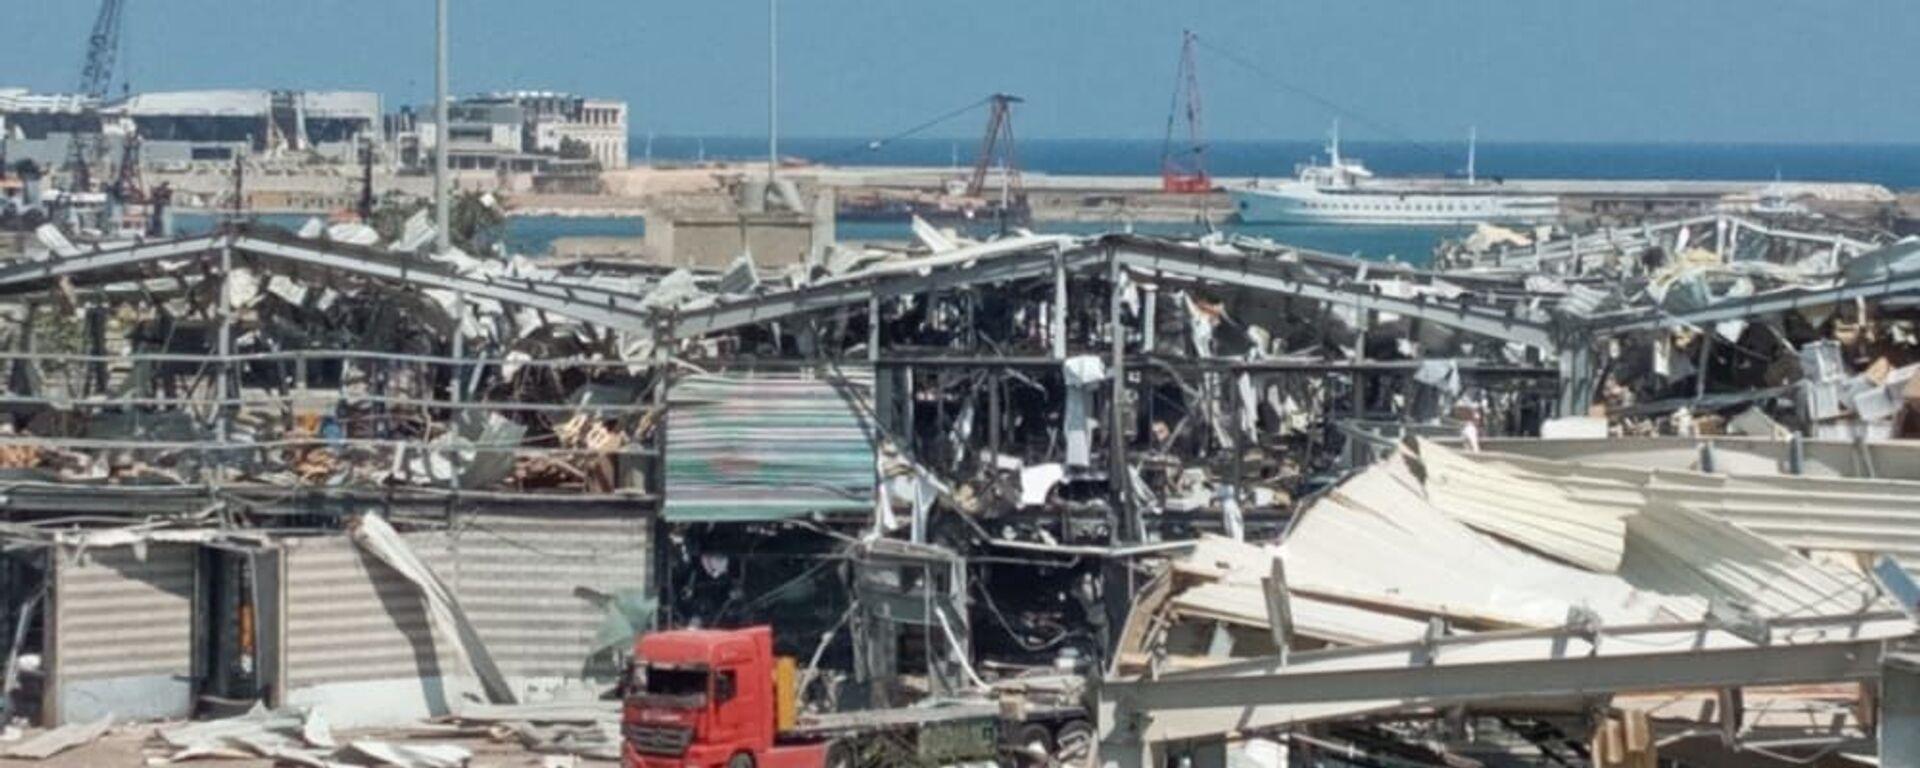 Aftermath of a massive explosion is seen in Beirut, Lebanon - Sputnik International, 1920, 05.08.2020